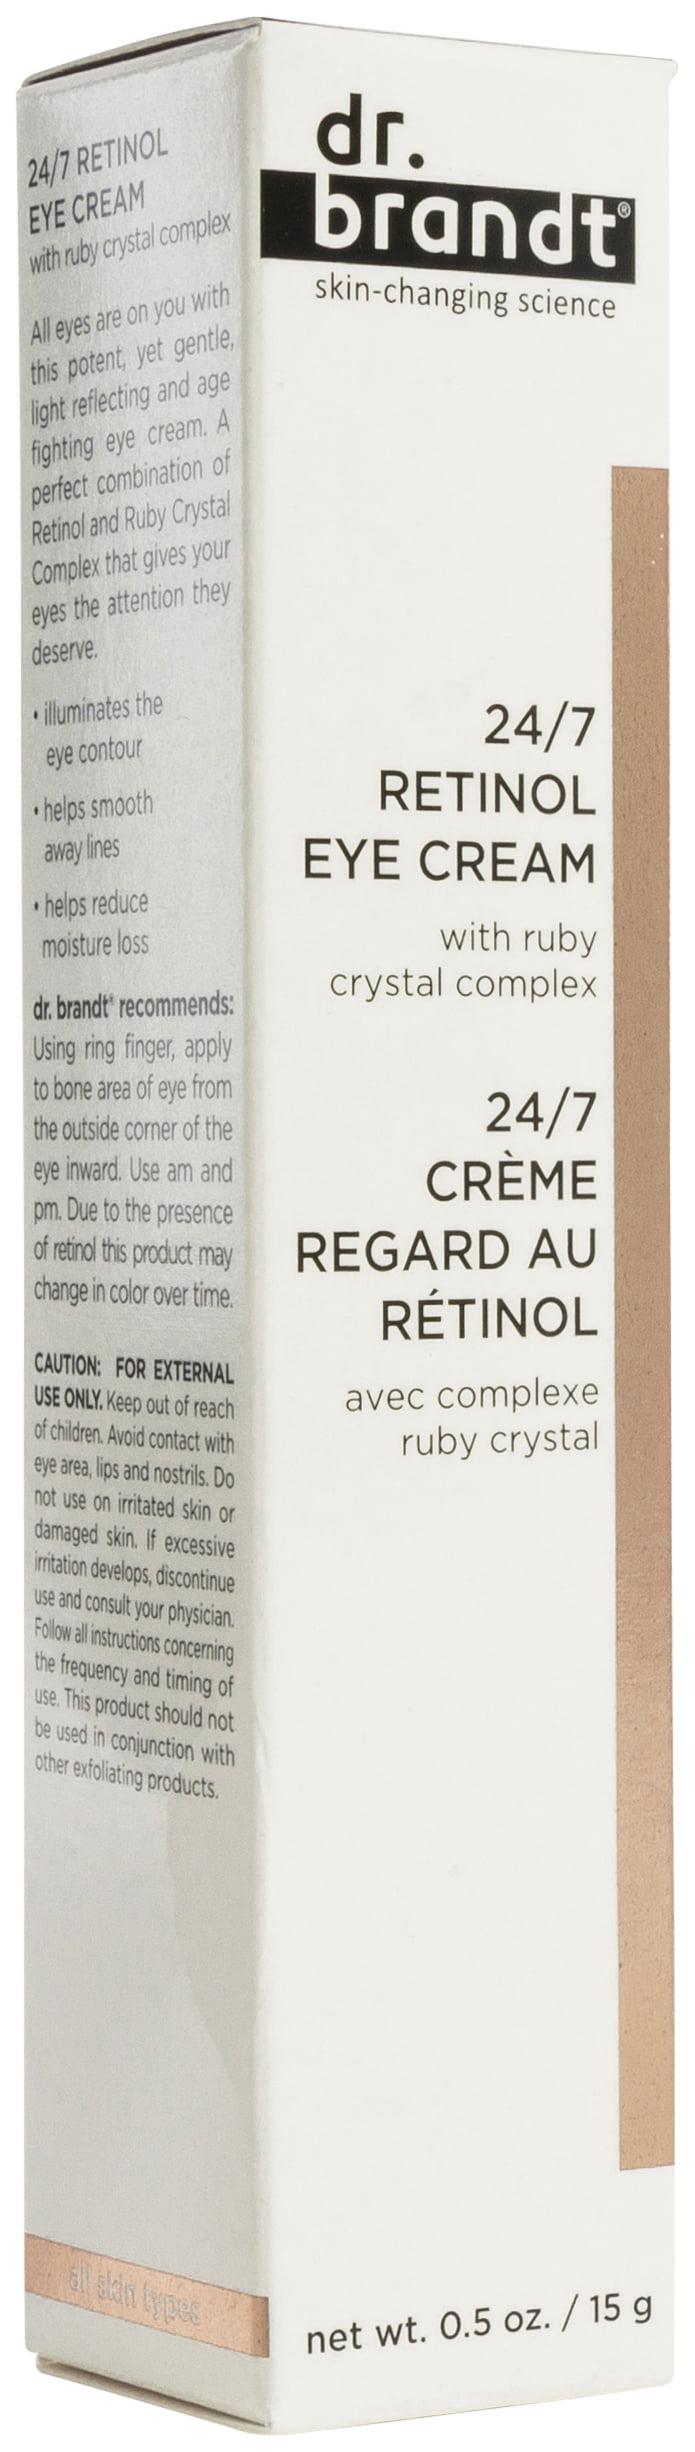 Walmart.com - Dr. Brandt - Dr. Brandt 24/7 Retinol Eye Cream 0.5 oz - Walmart.com